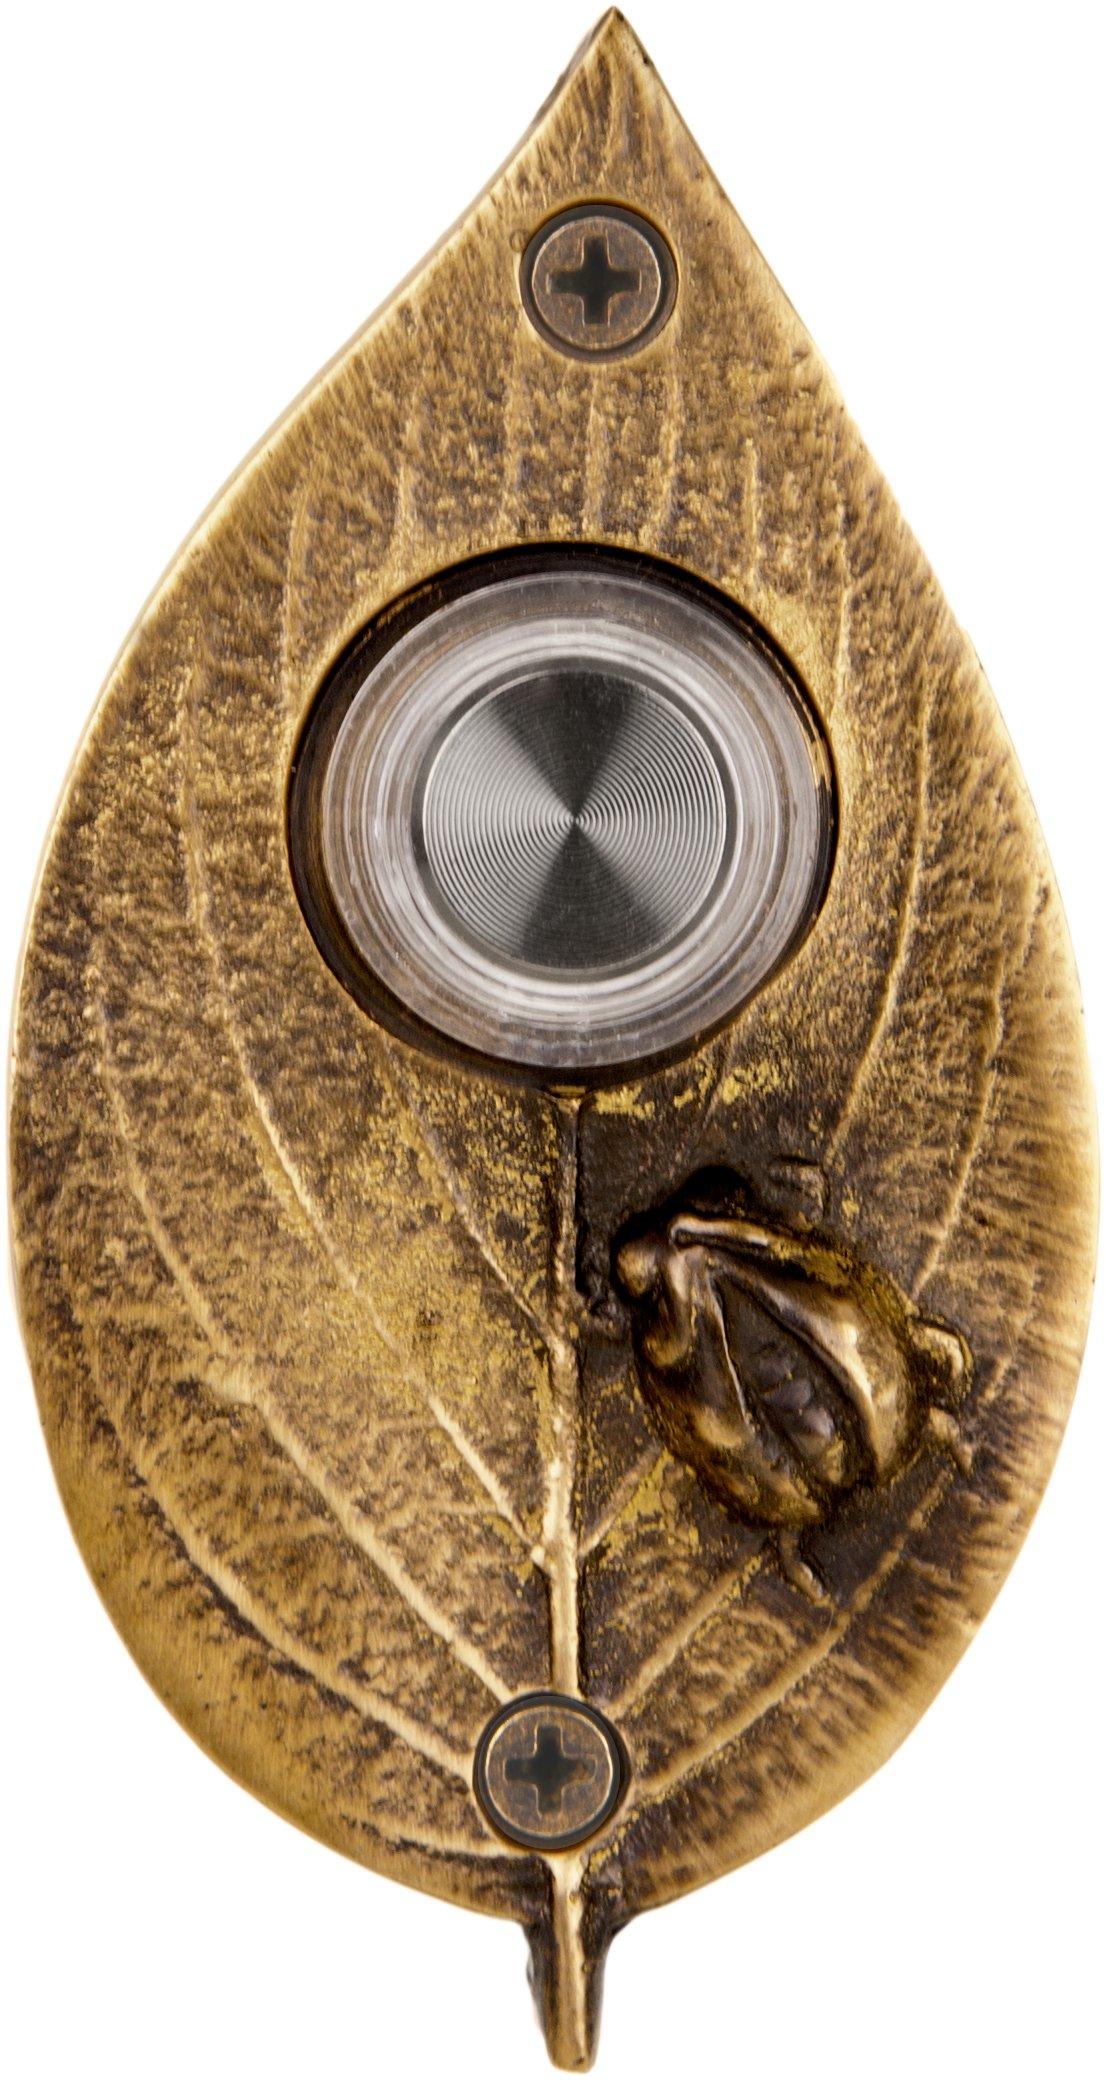 Waterwood Solid Brass Ladybug on Leaf Doorbell in Antique Brass